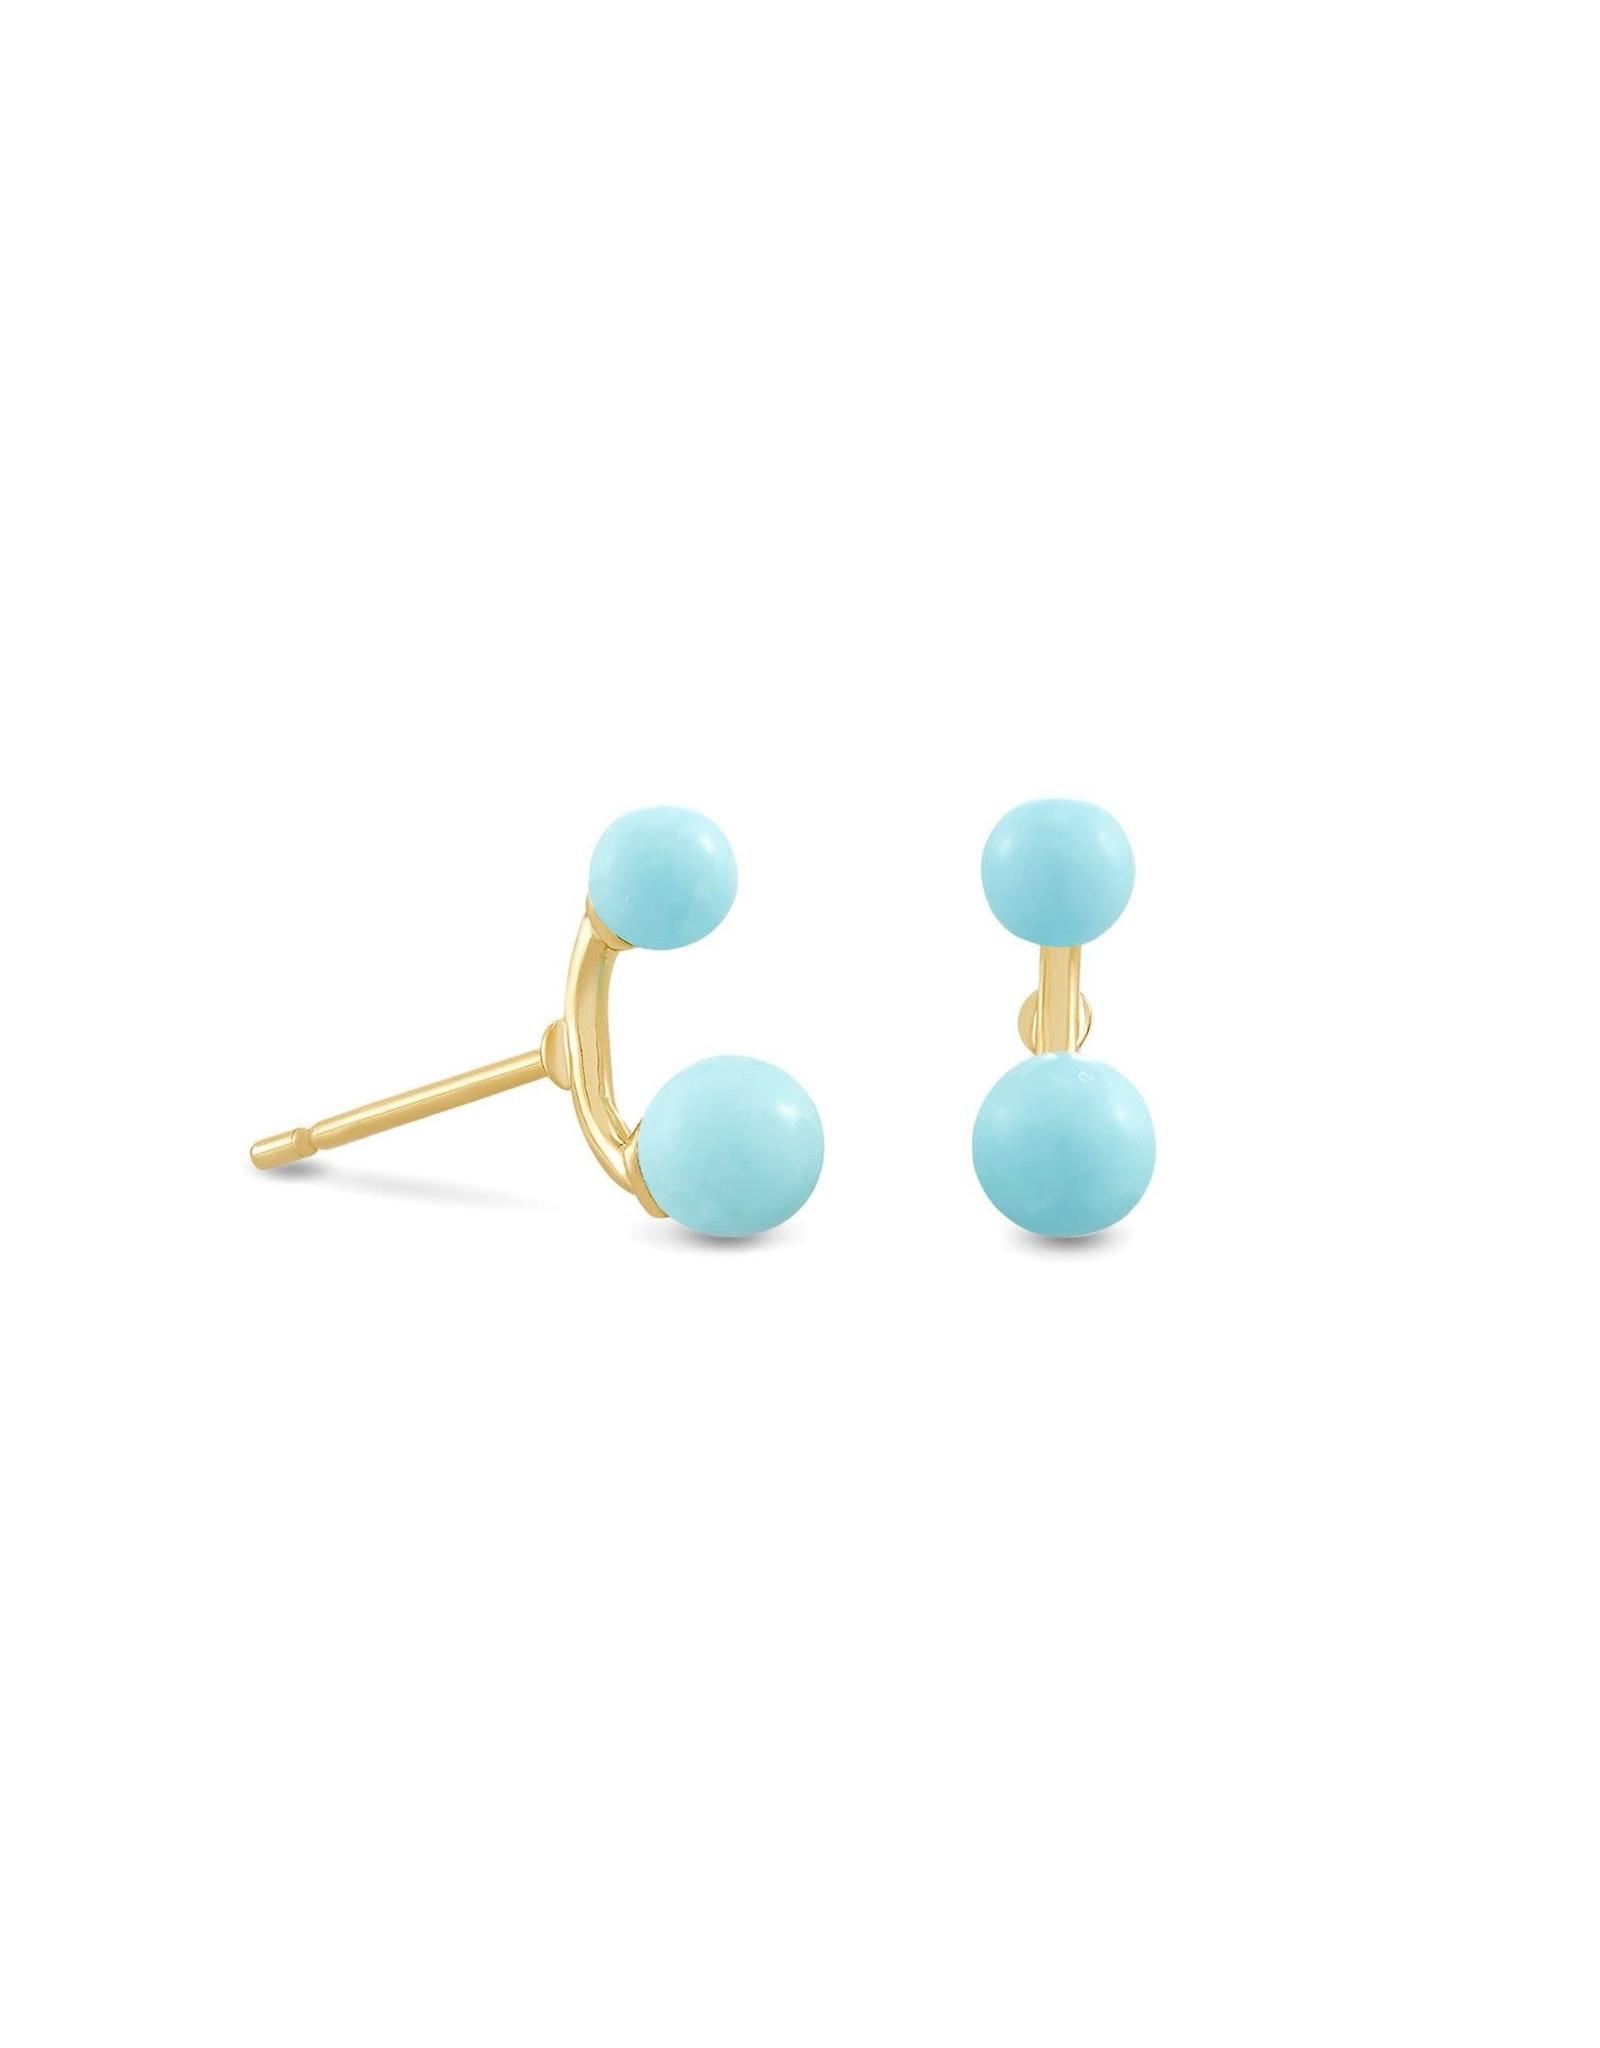 Kendra Scott Demi Stud Earring - Light Blue Magnesite/Gold